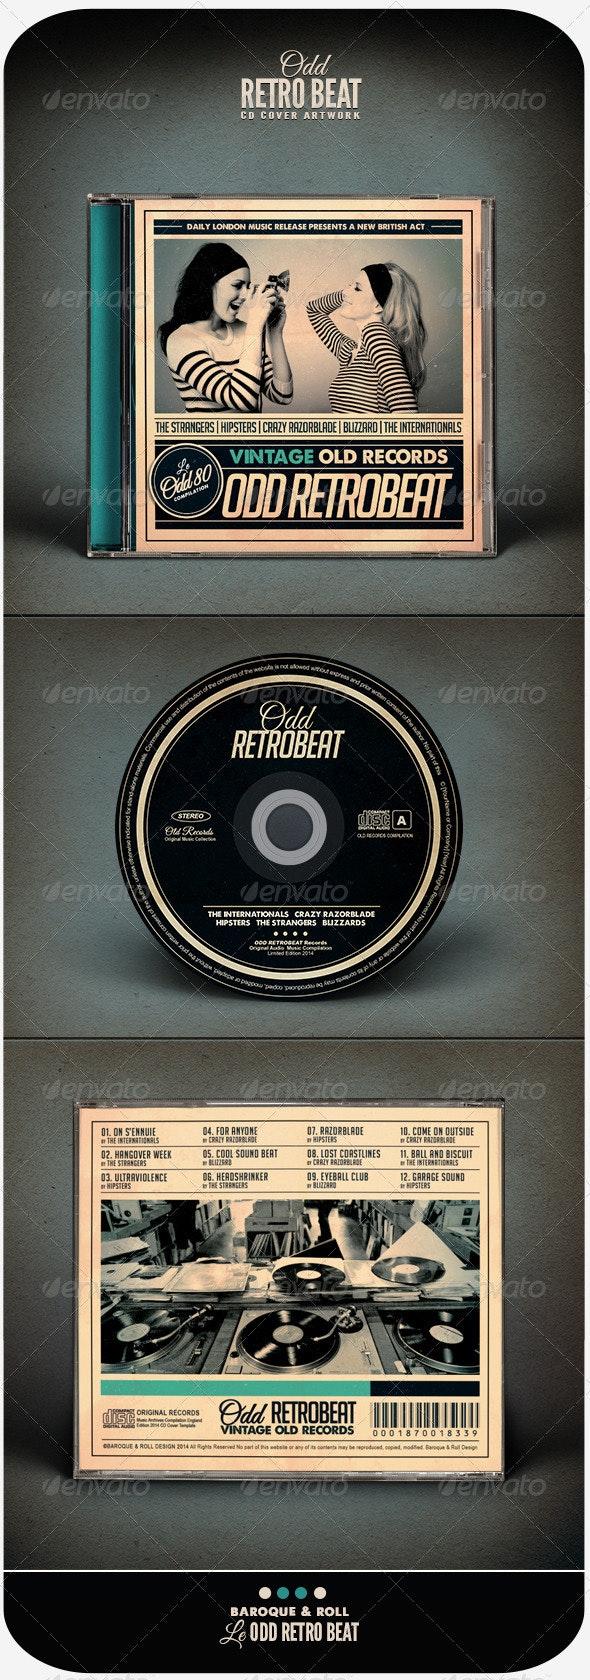 Odd Retro Beat - CD & DVD Artwork Print Templates